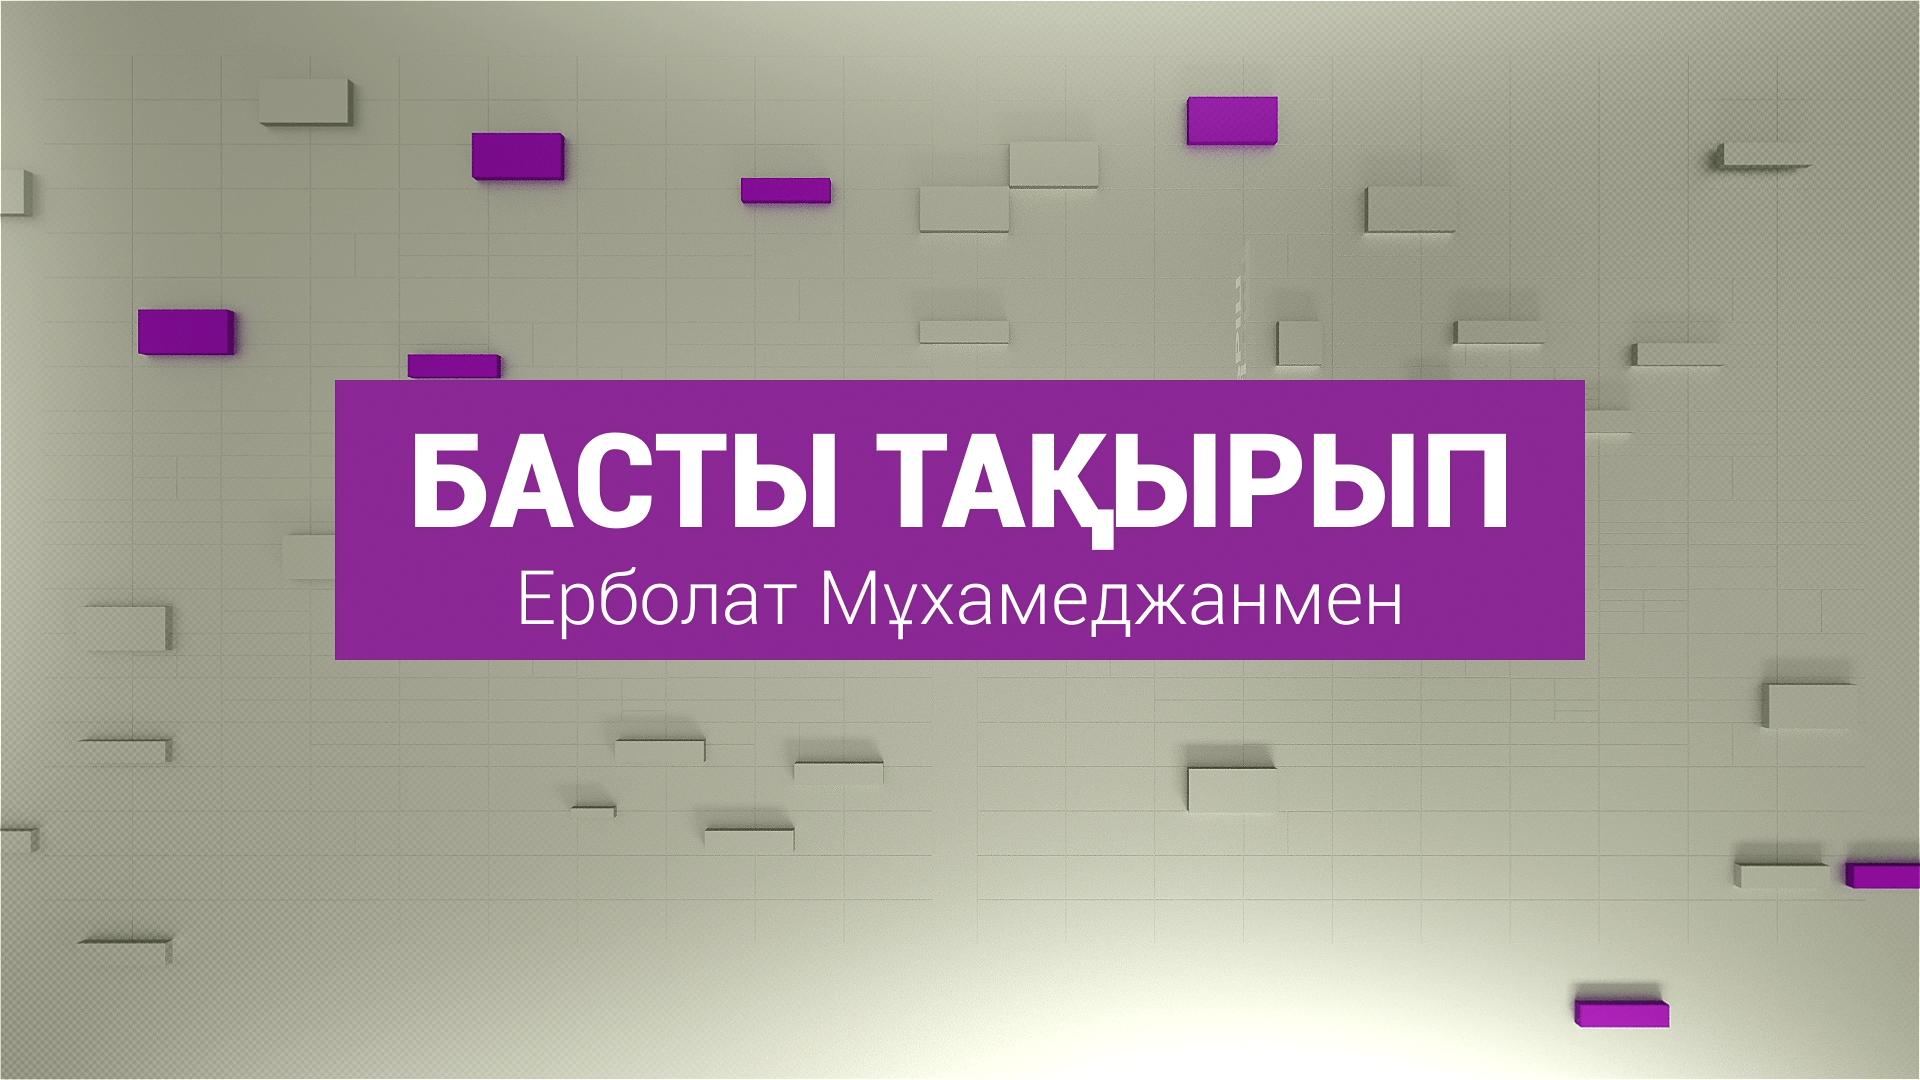 https://inbusiness.kz/ru/images/original/9/images/pj4gq9cF.png